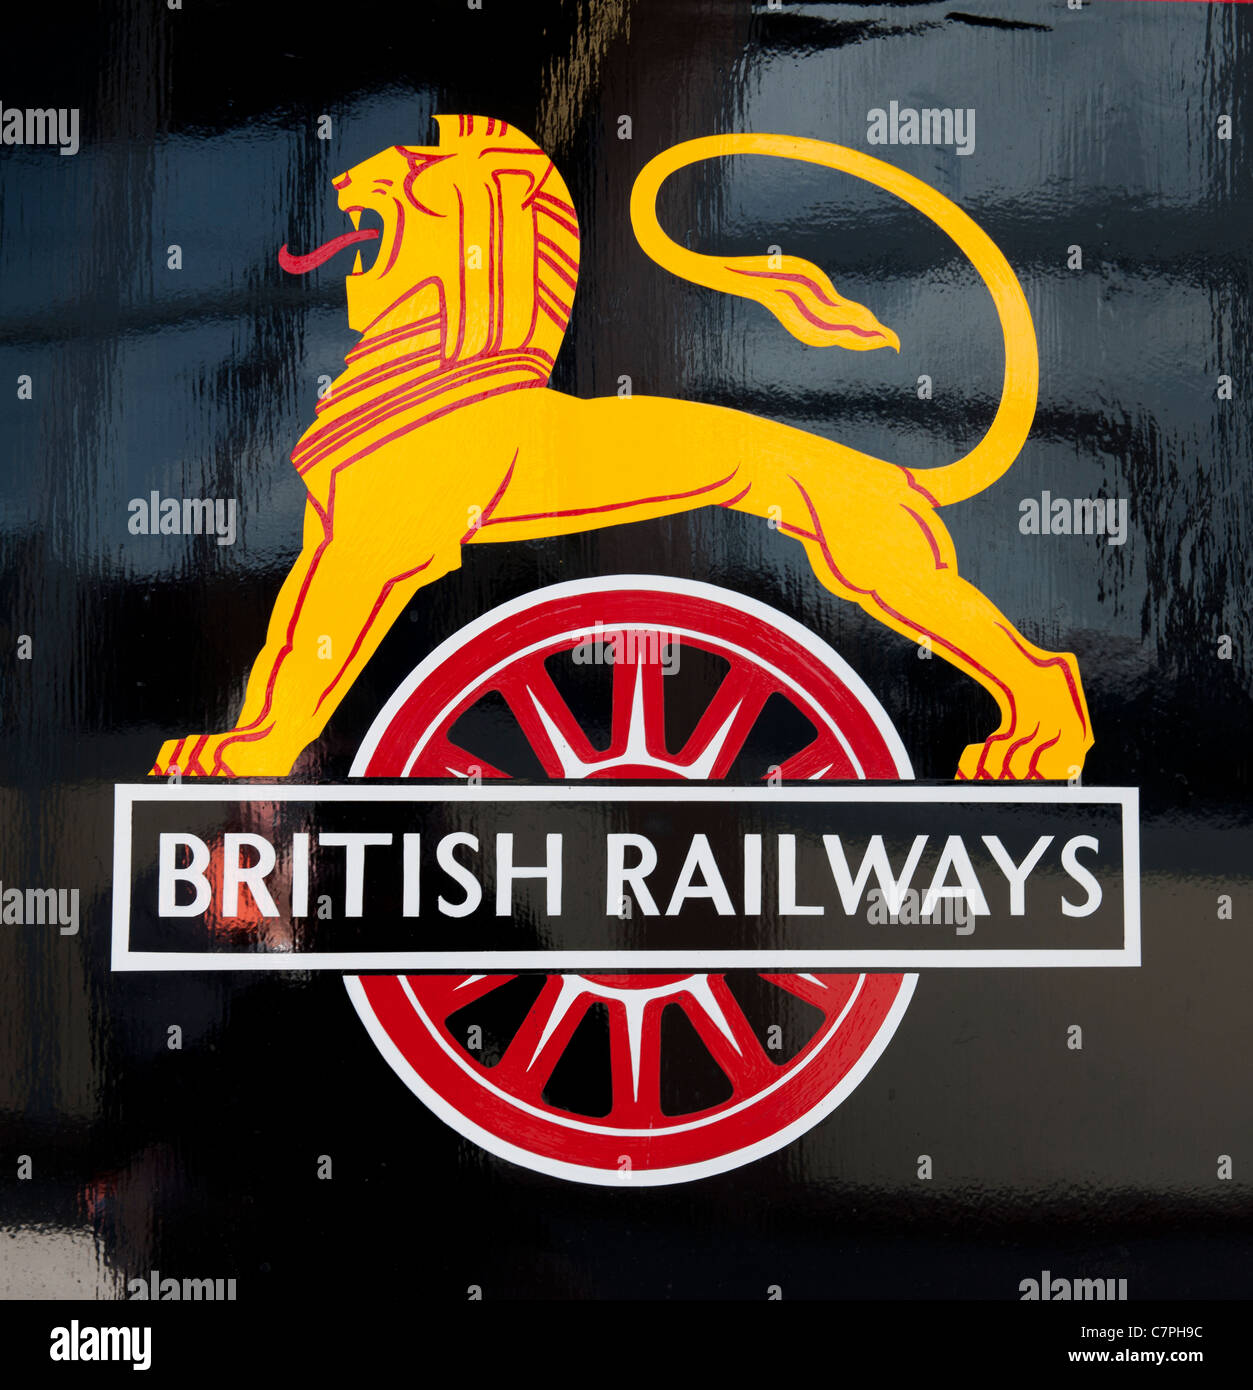 British railways logo painted on torquay manor steam locomotive british railways logo painted on torquay manor steam locomotive paignton to dartmouth steam biocorpaavc Images